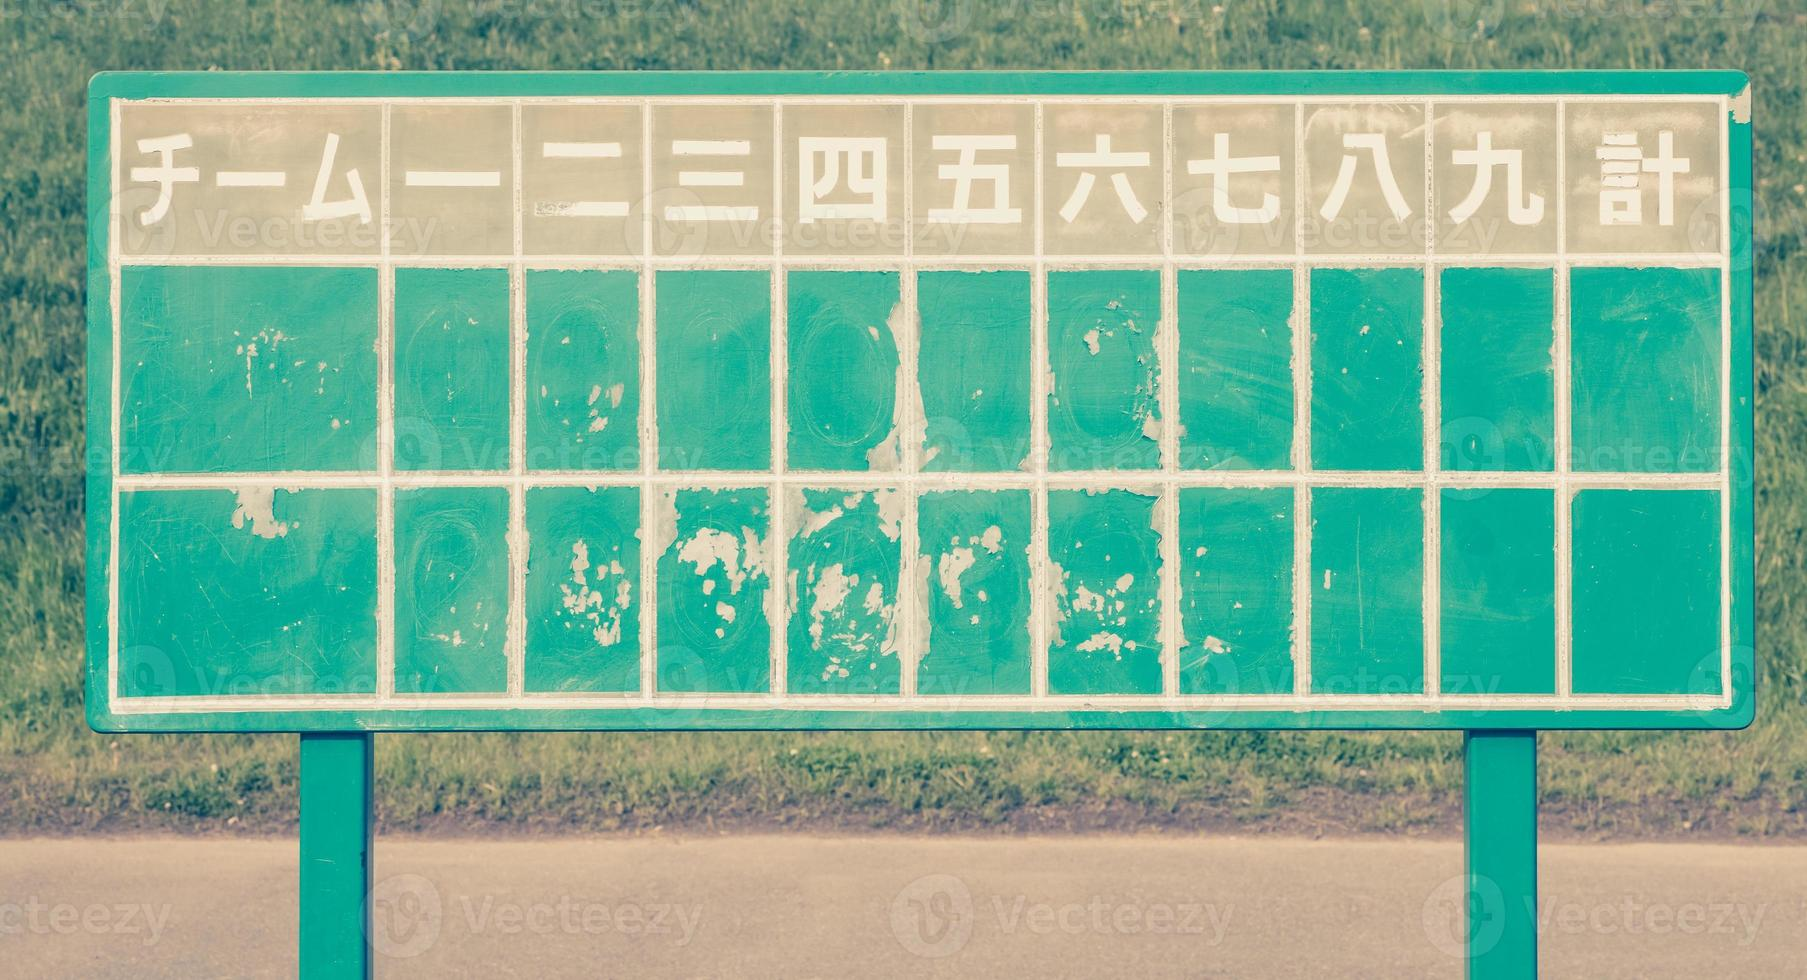 Japanese baseball score board photo